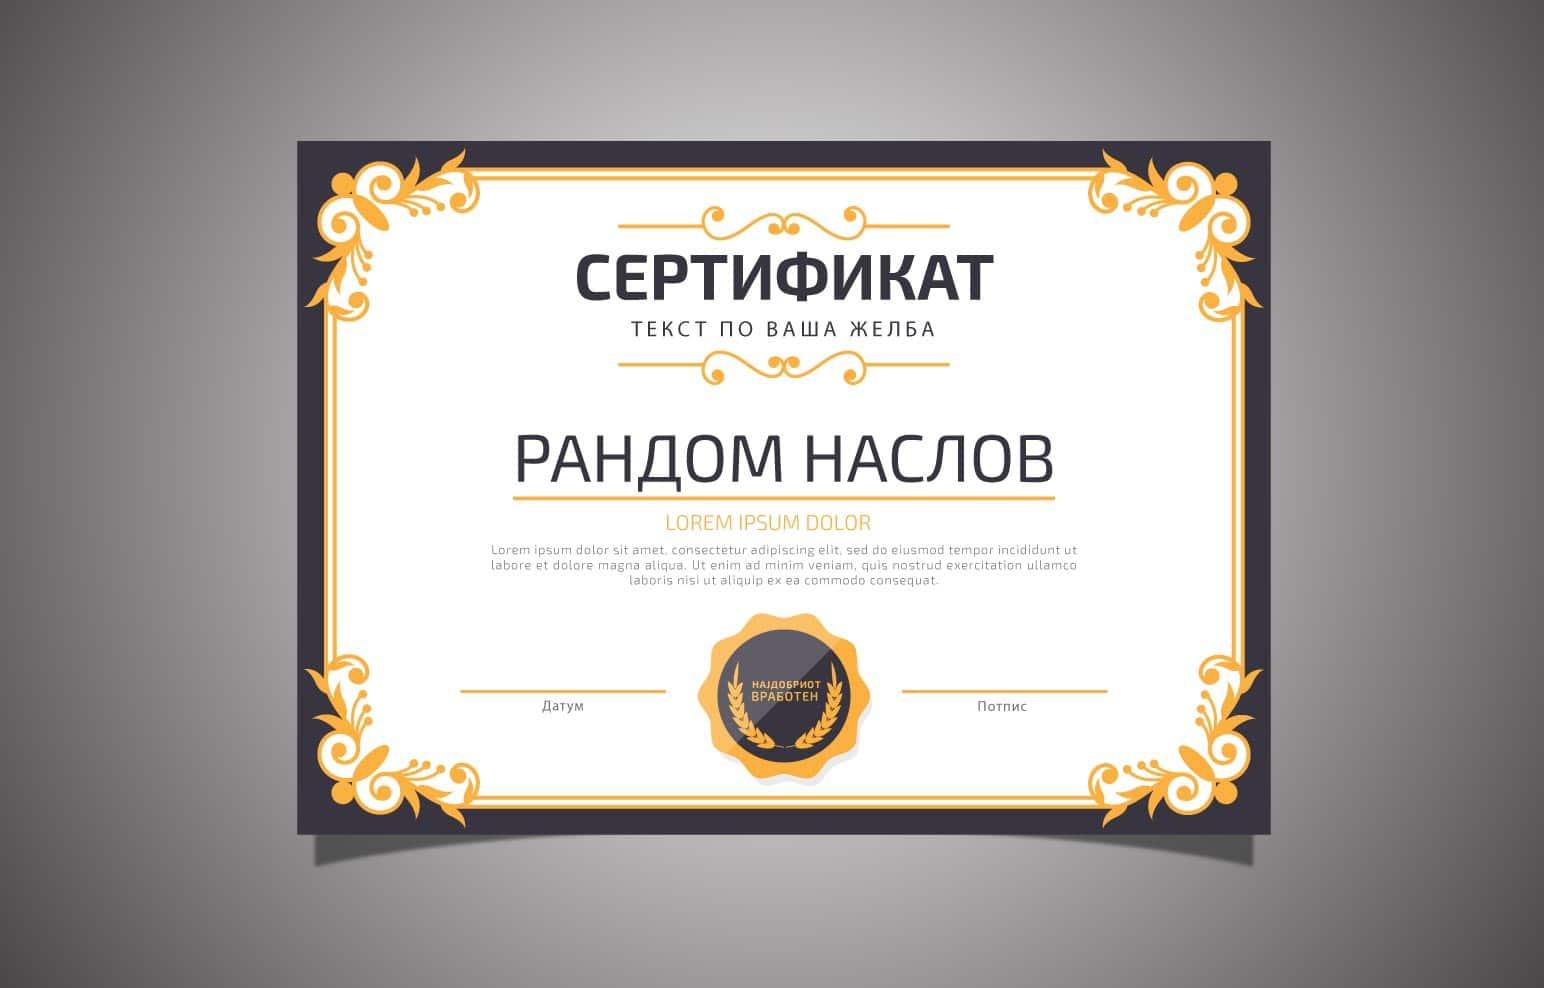 Kreirame sekakov tip na sertifikati i diplomi, Креираме секаков тип на сертификати и дипломи